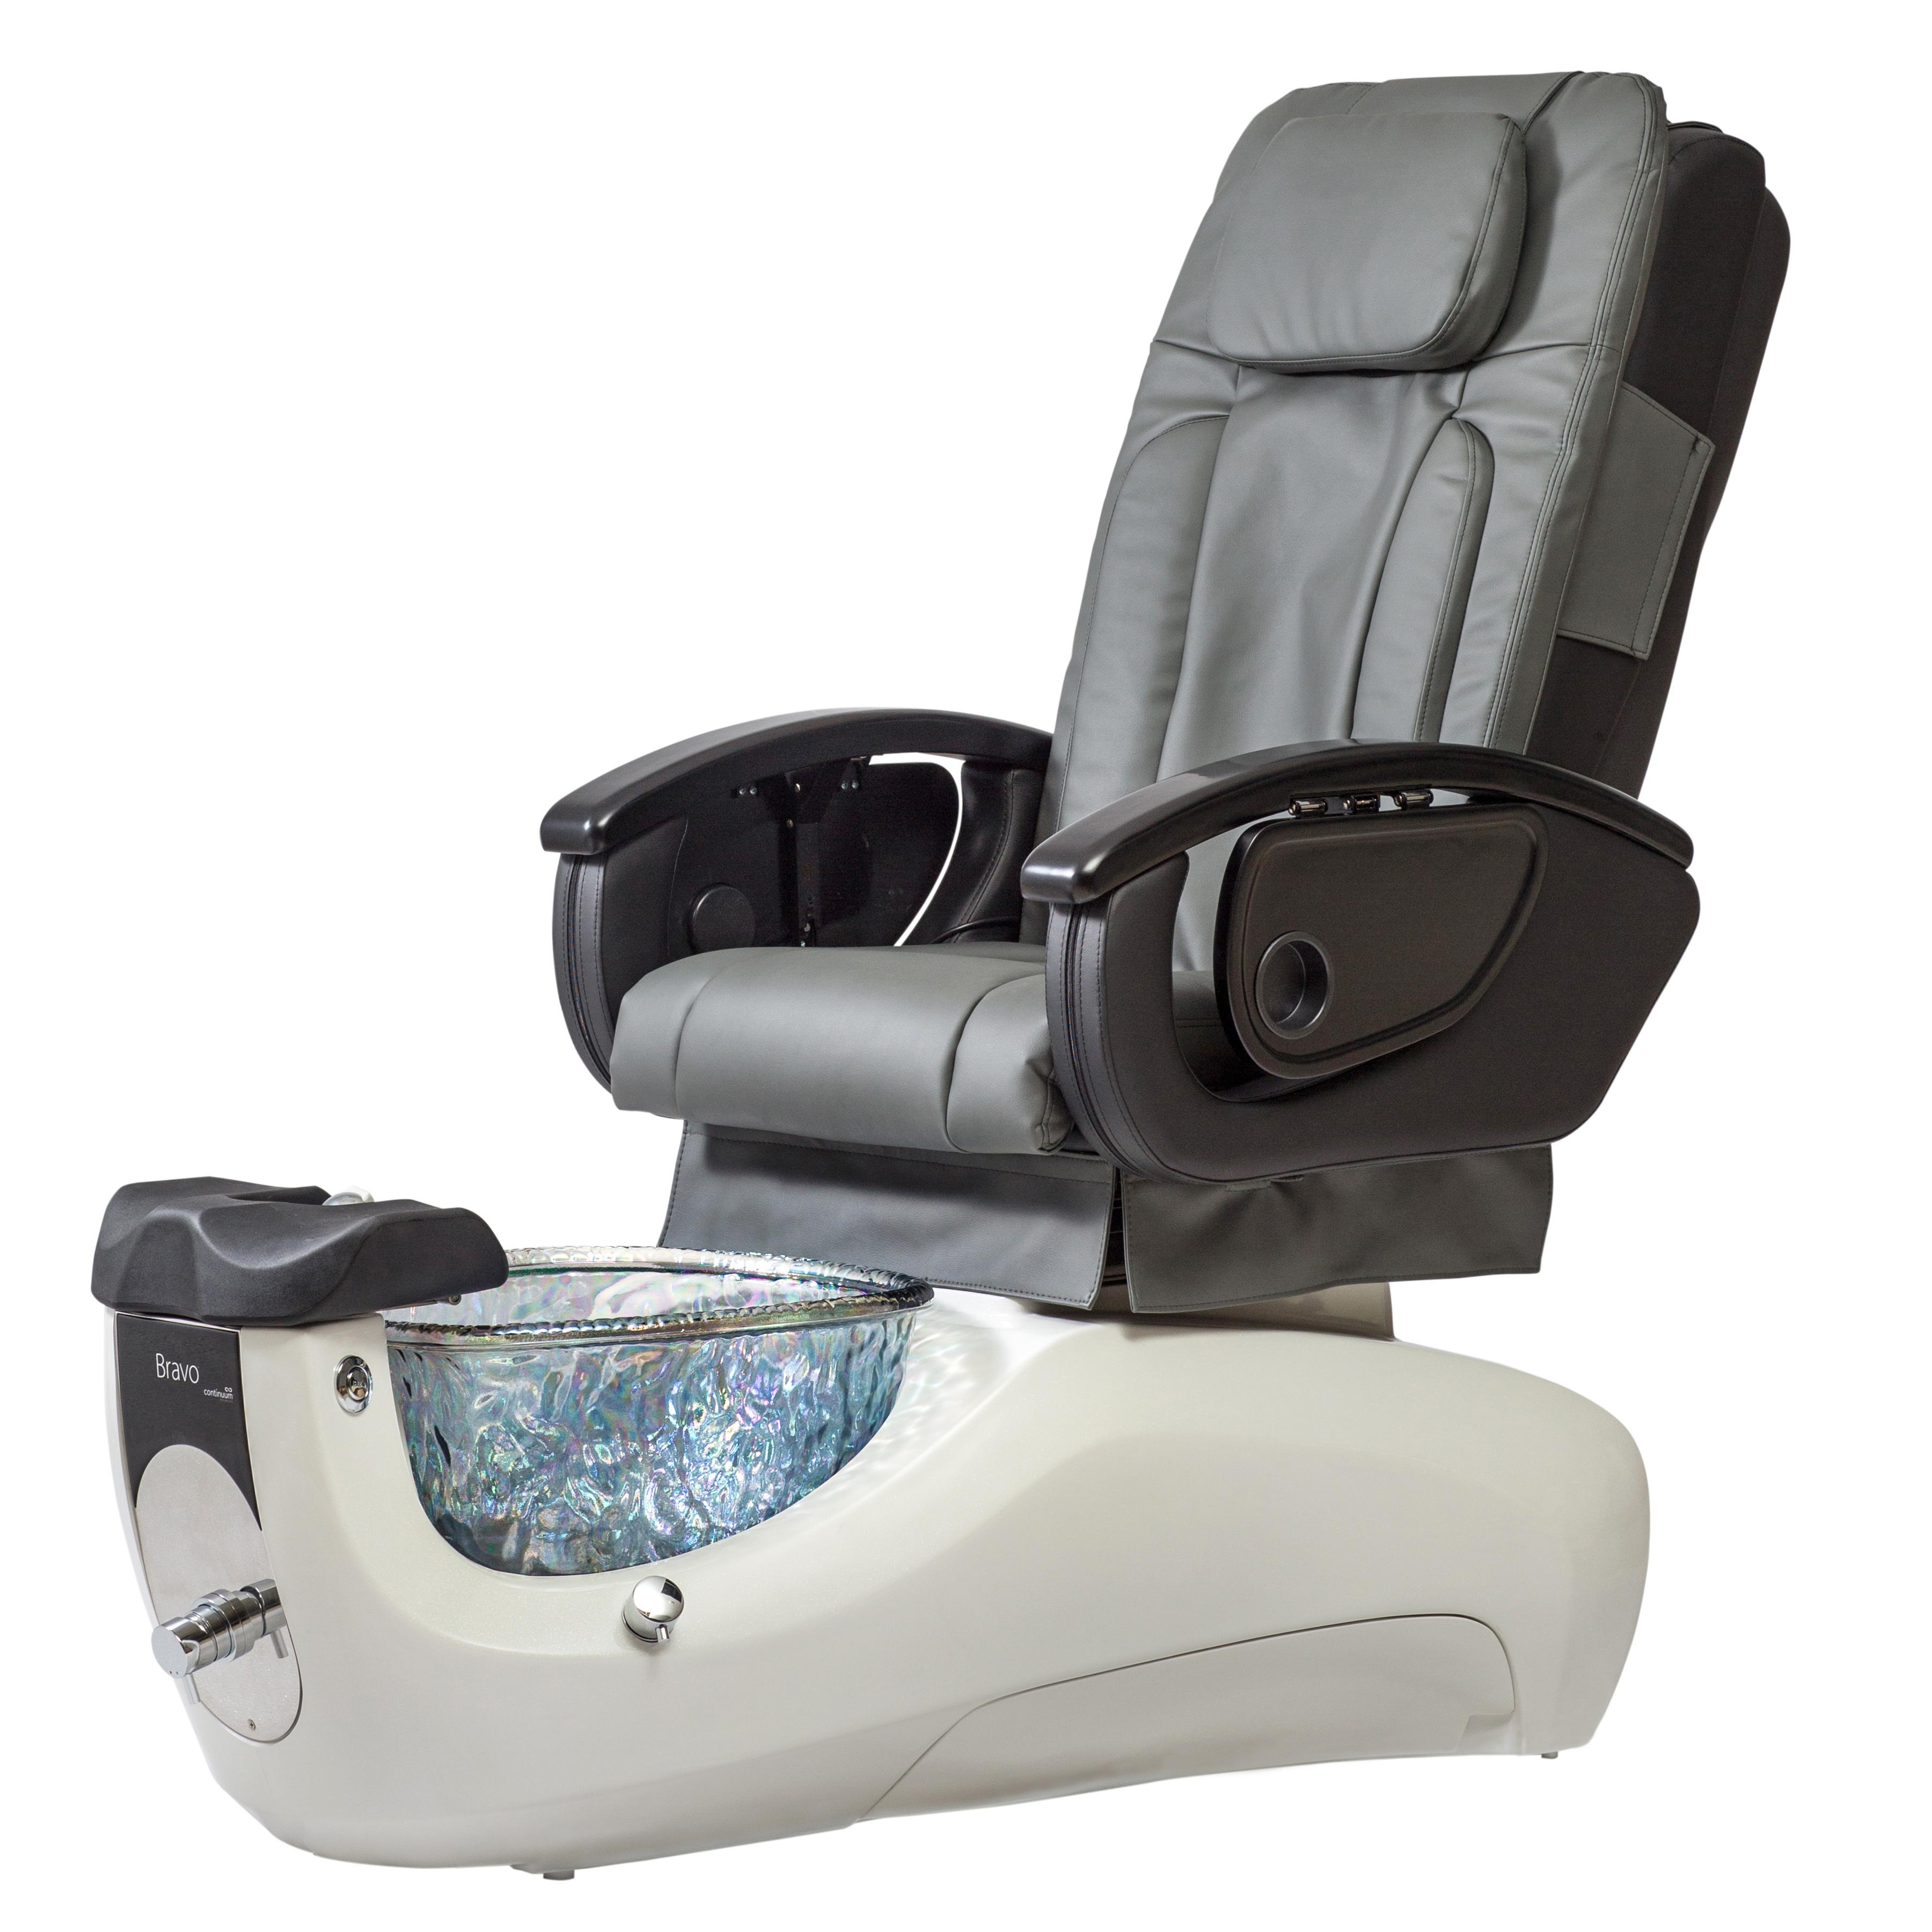 massage pedicure chair plans for adirondack rocking bravo ve spa station spas f142 continuum